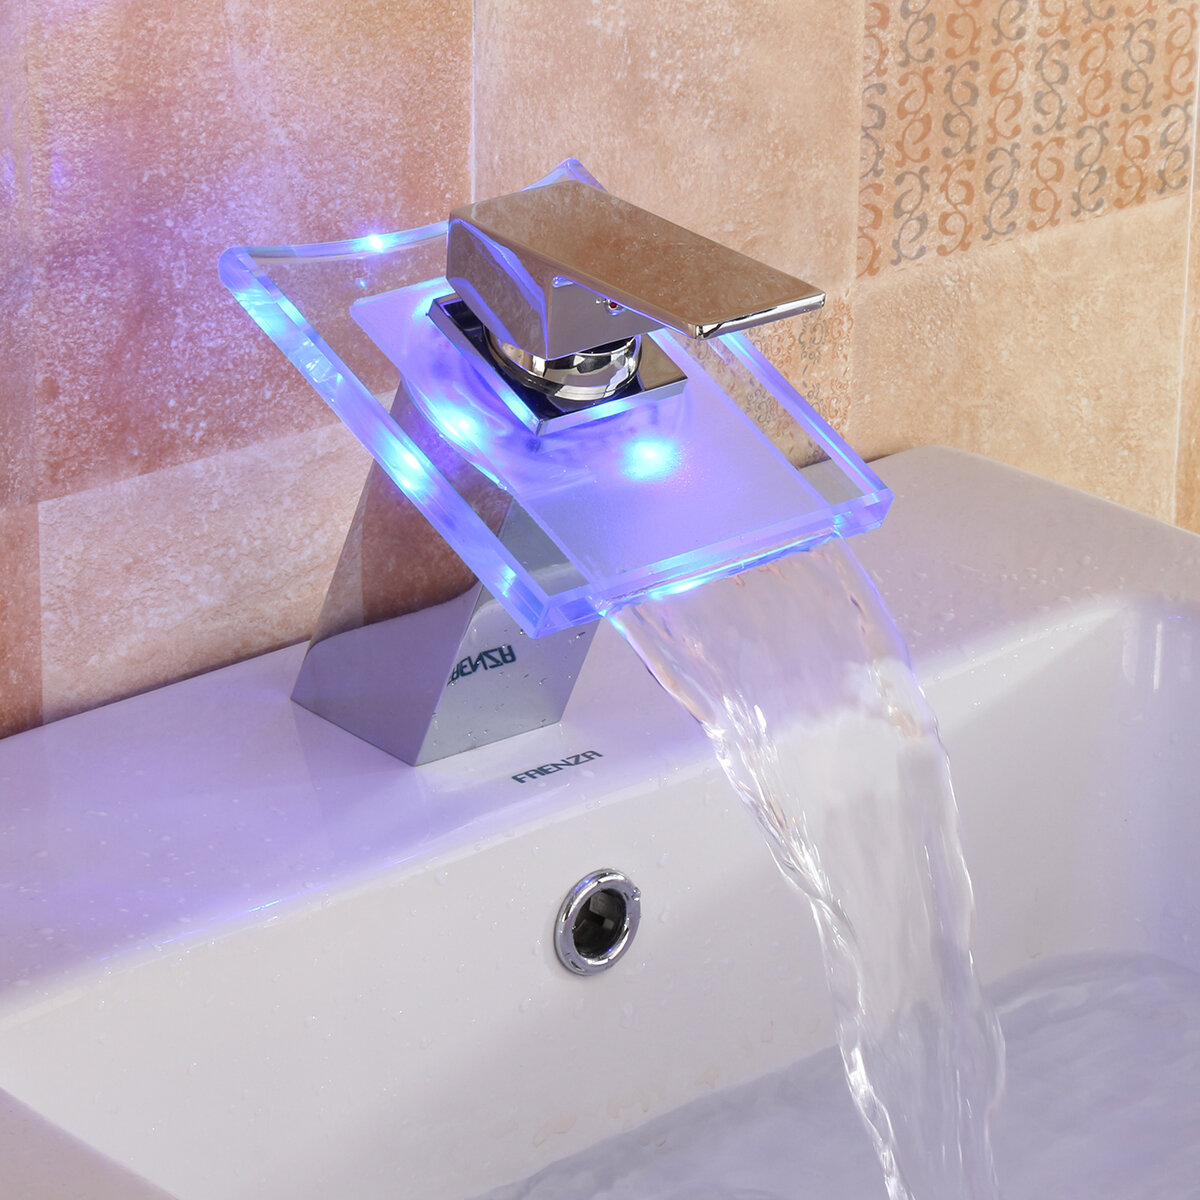 Led Color Changing Waterfall Faucet Bathroom Sink Faucet Glass Basin Bathtub Mixer Tap Sale Banggood Com